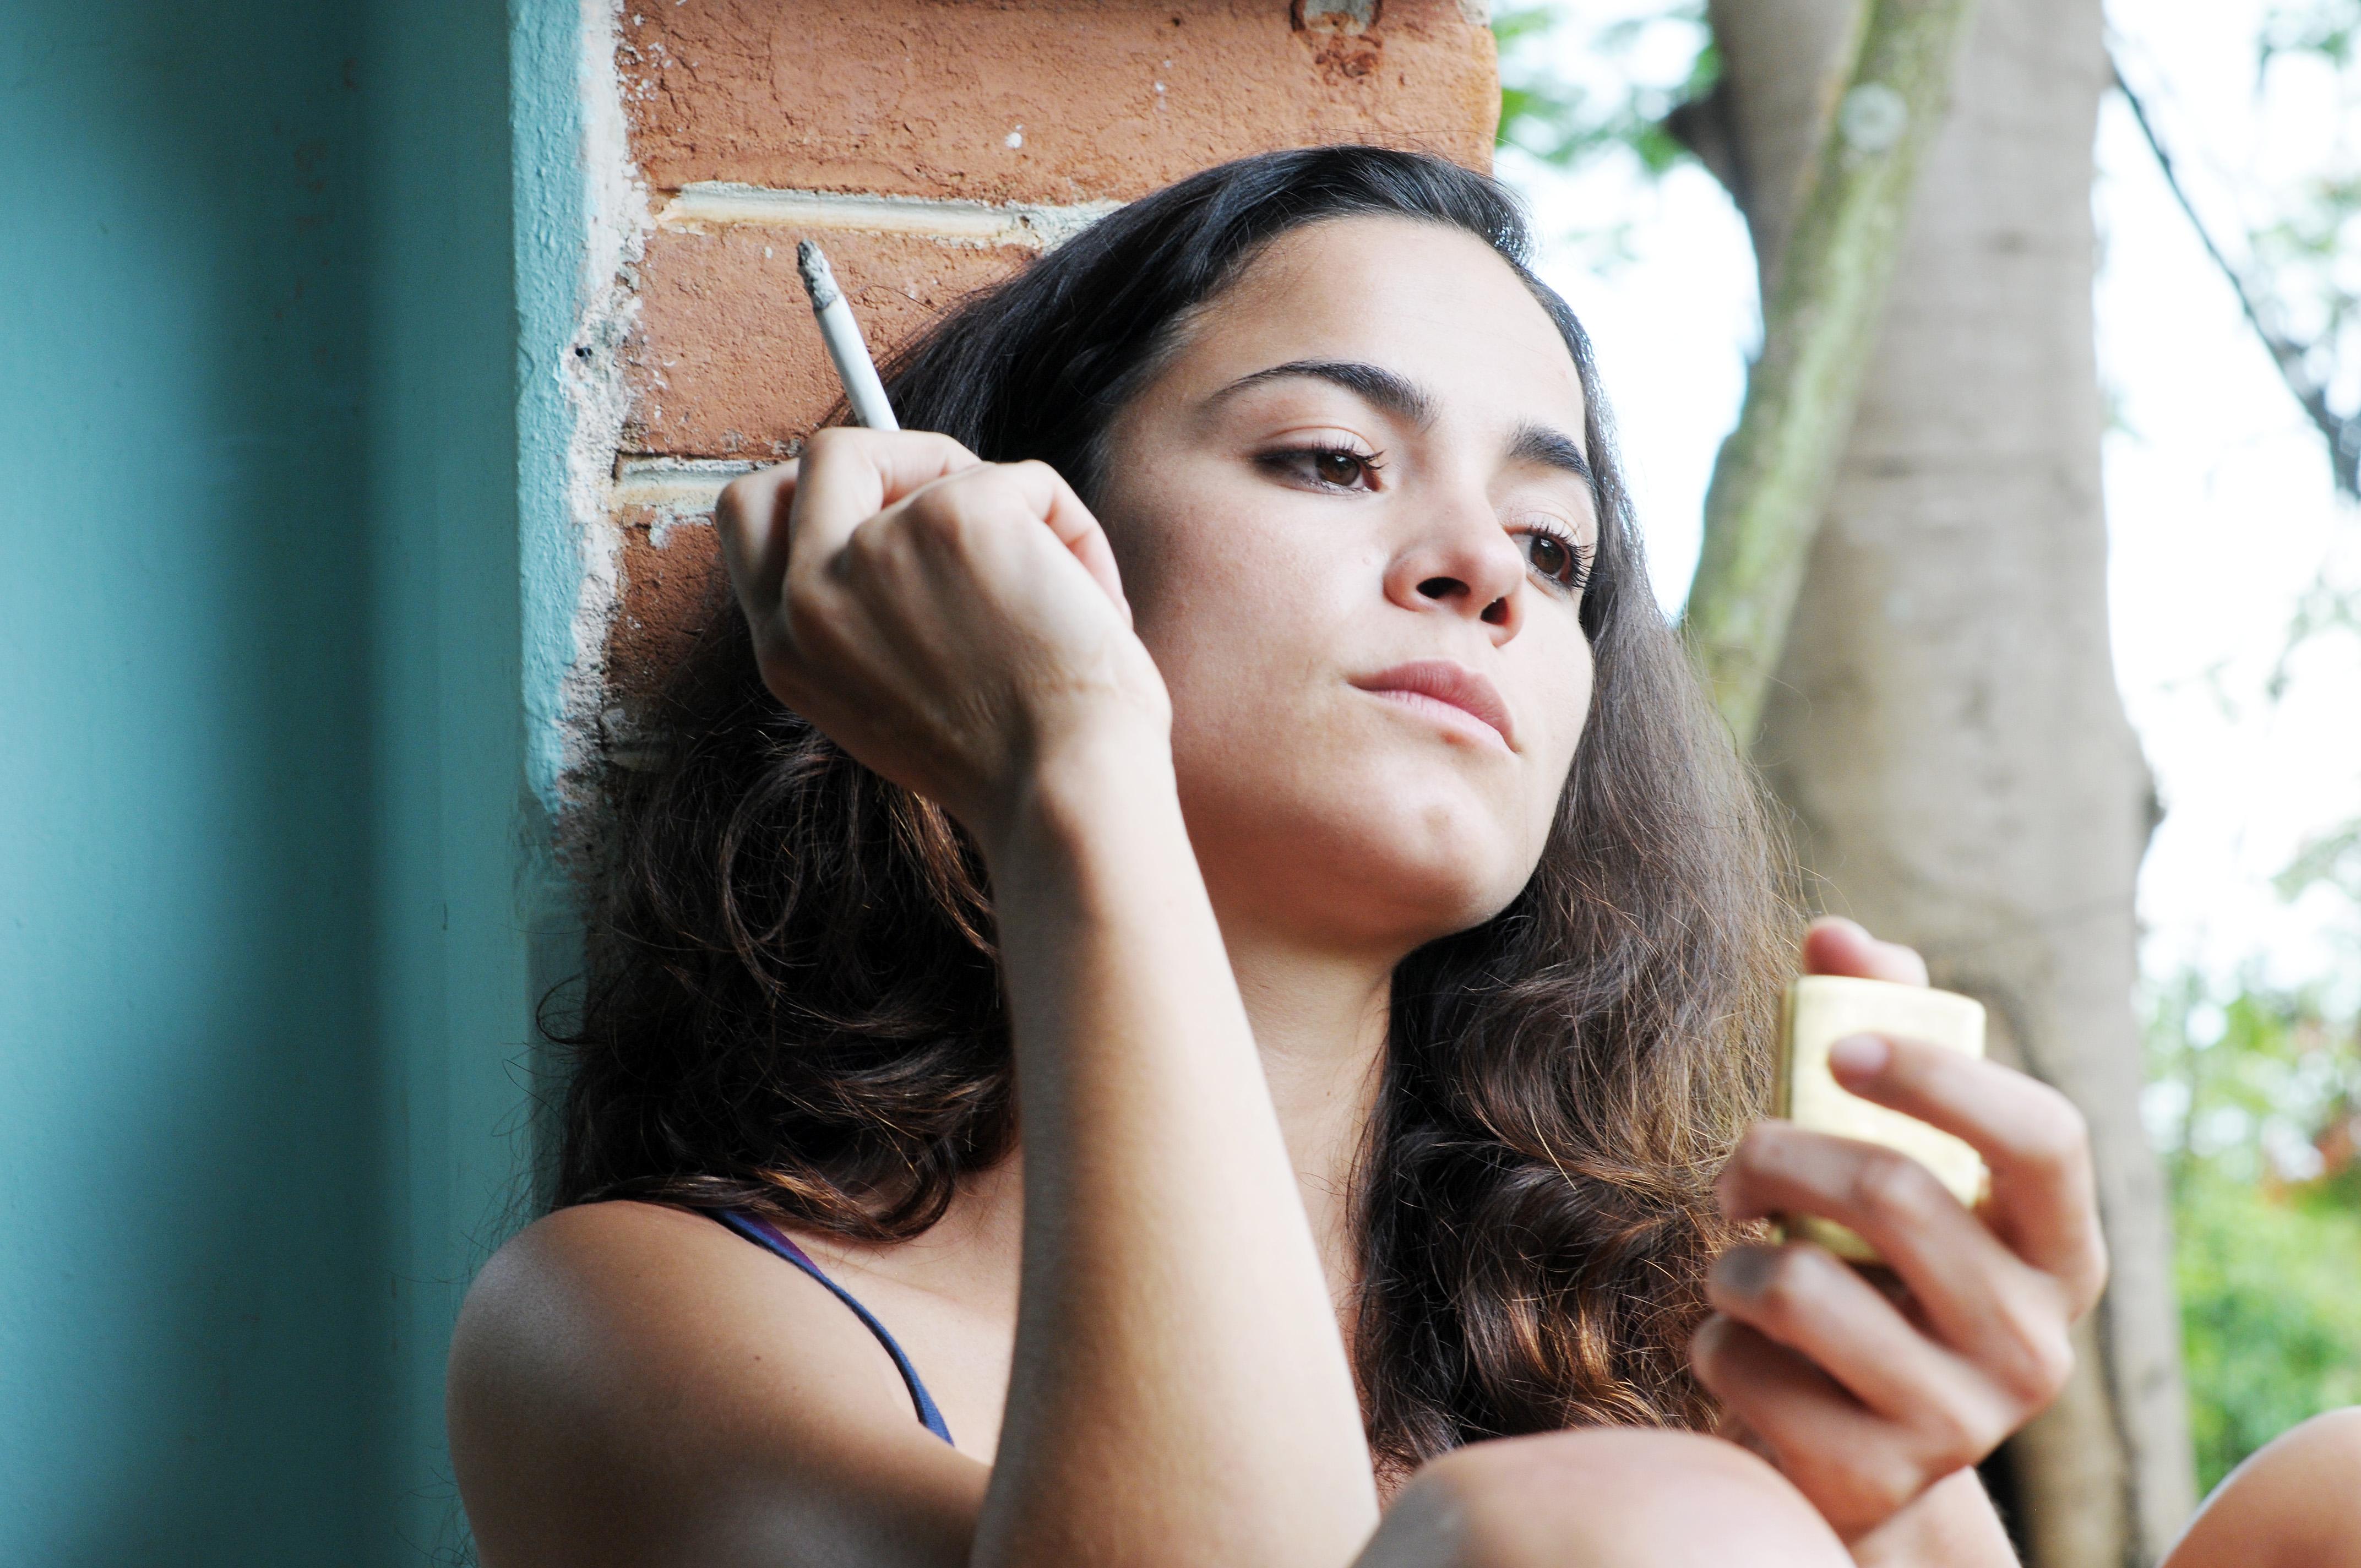 English-Language Version of 'La Reina del Sur' Starring Alice Braga Is Coming Soon